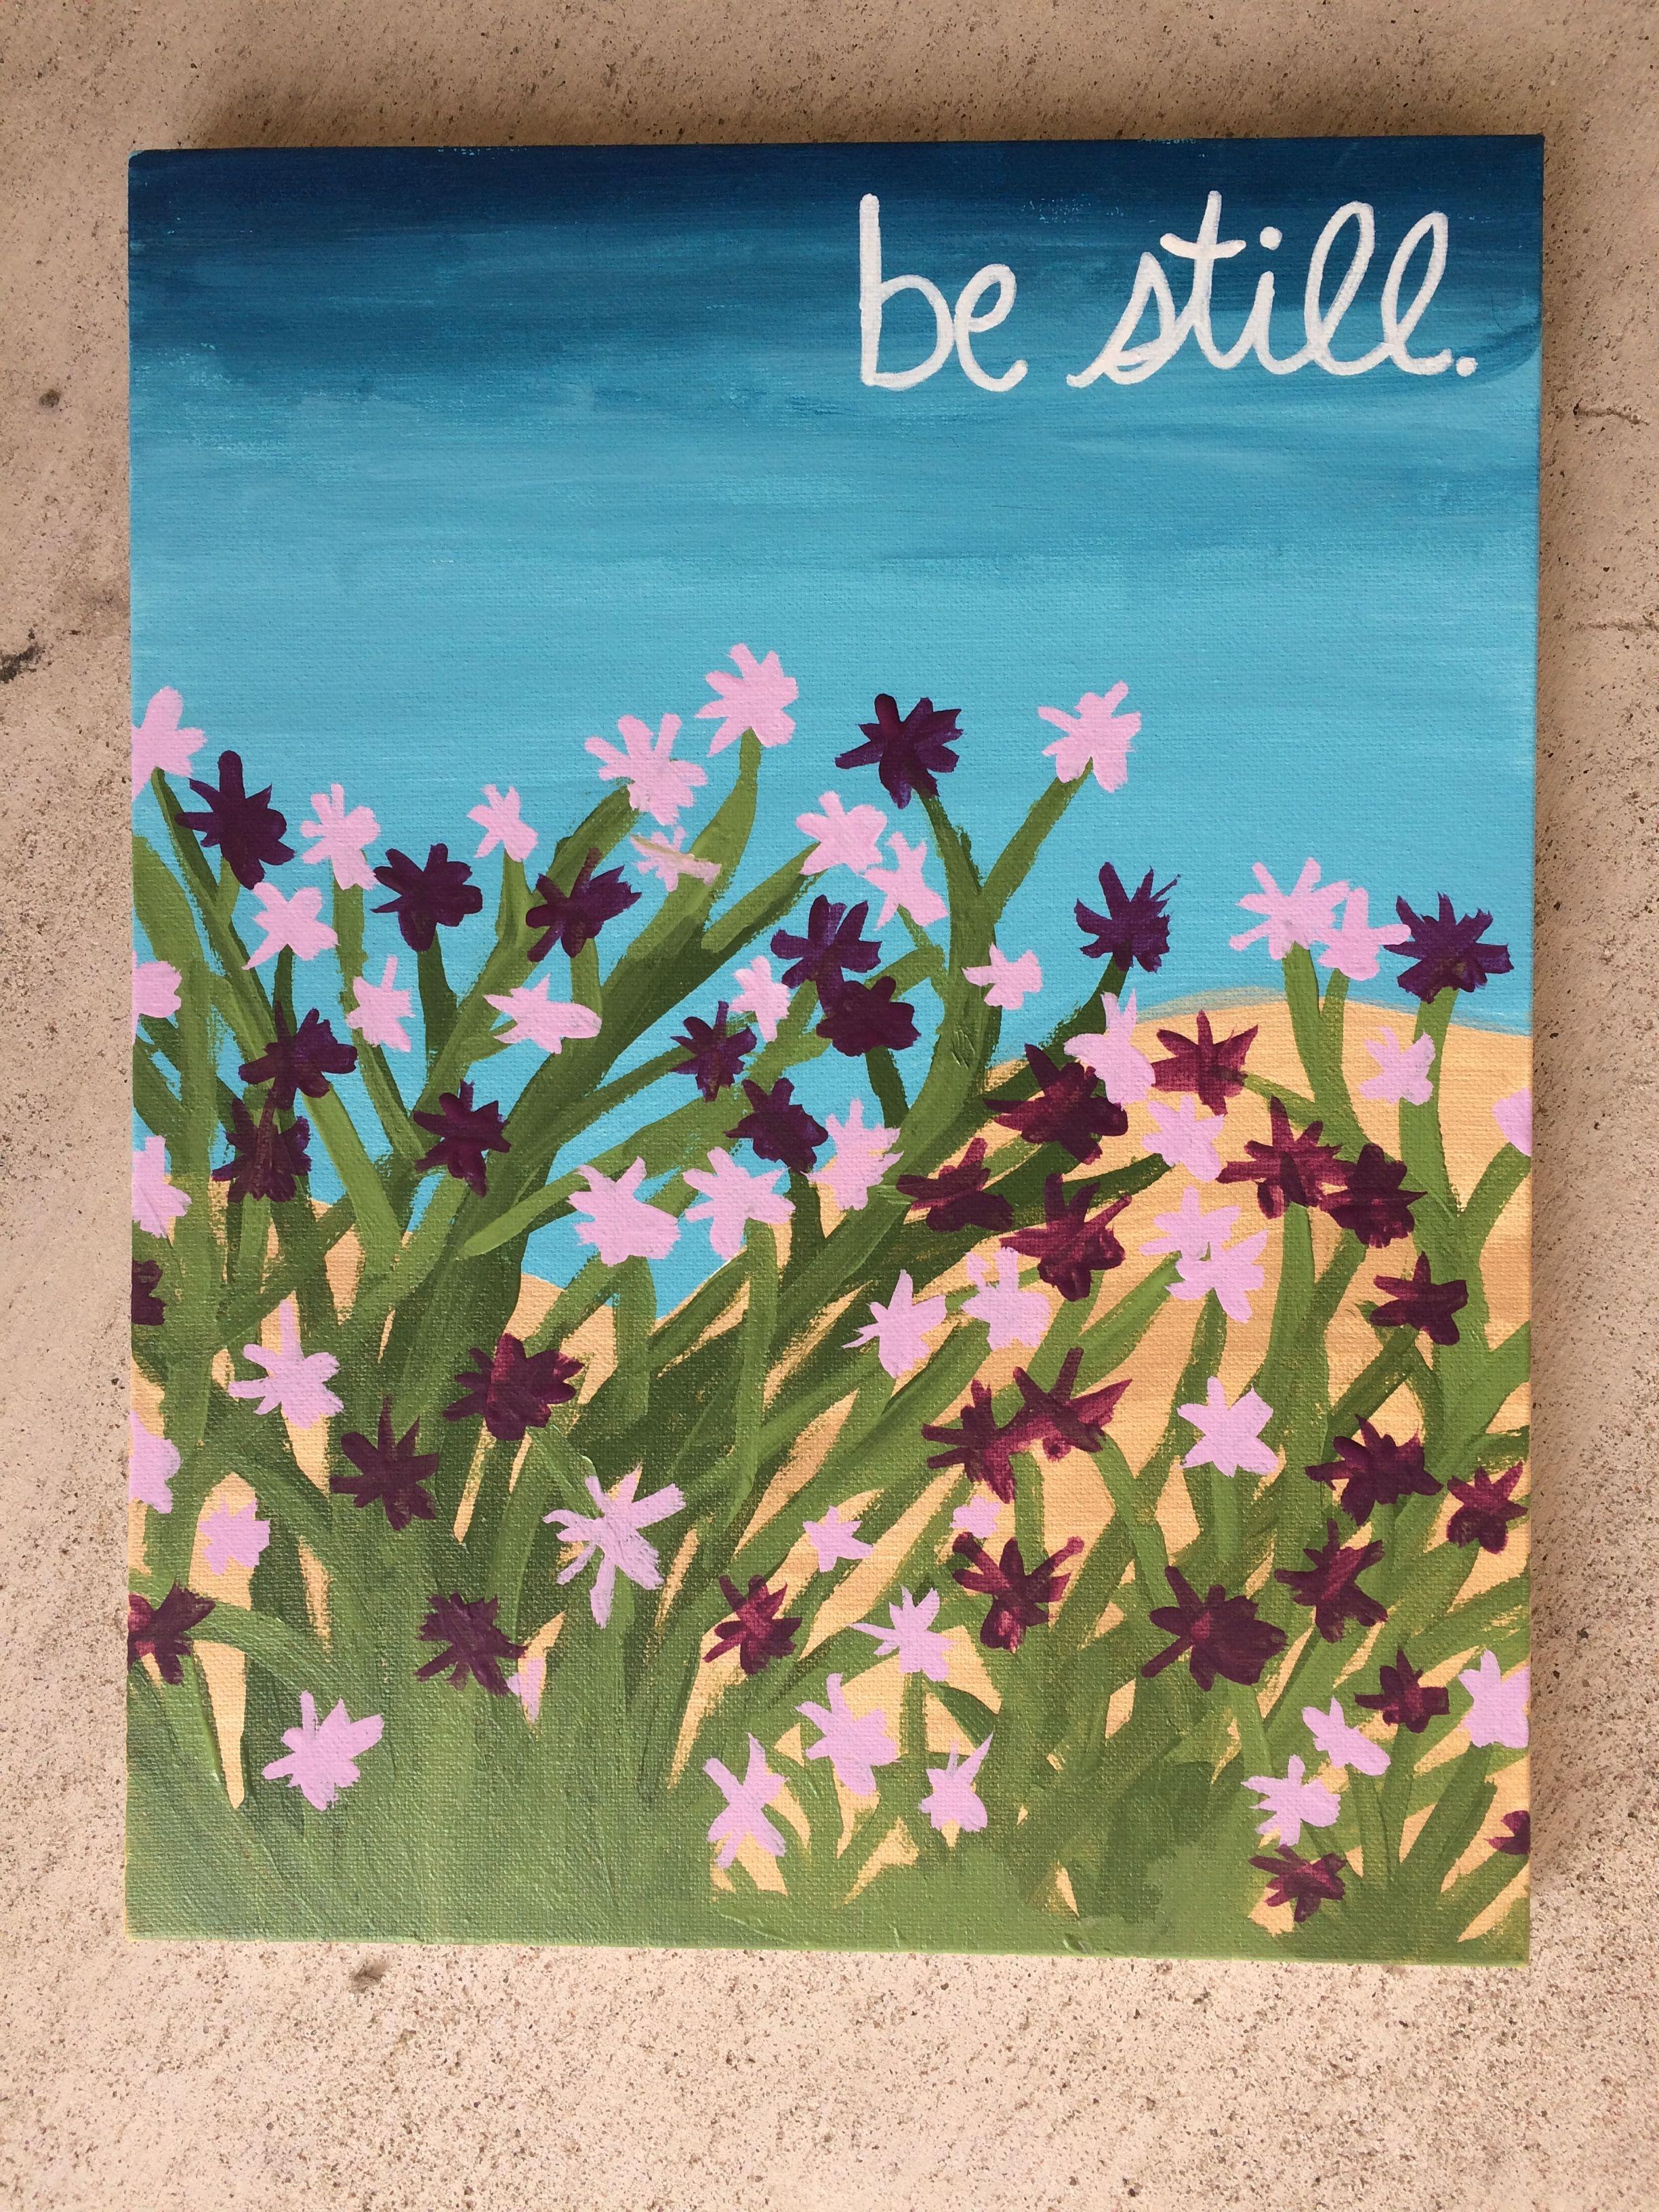 Canvas Art :) #Bestill #canvasart